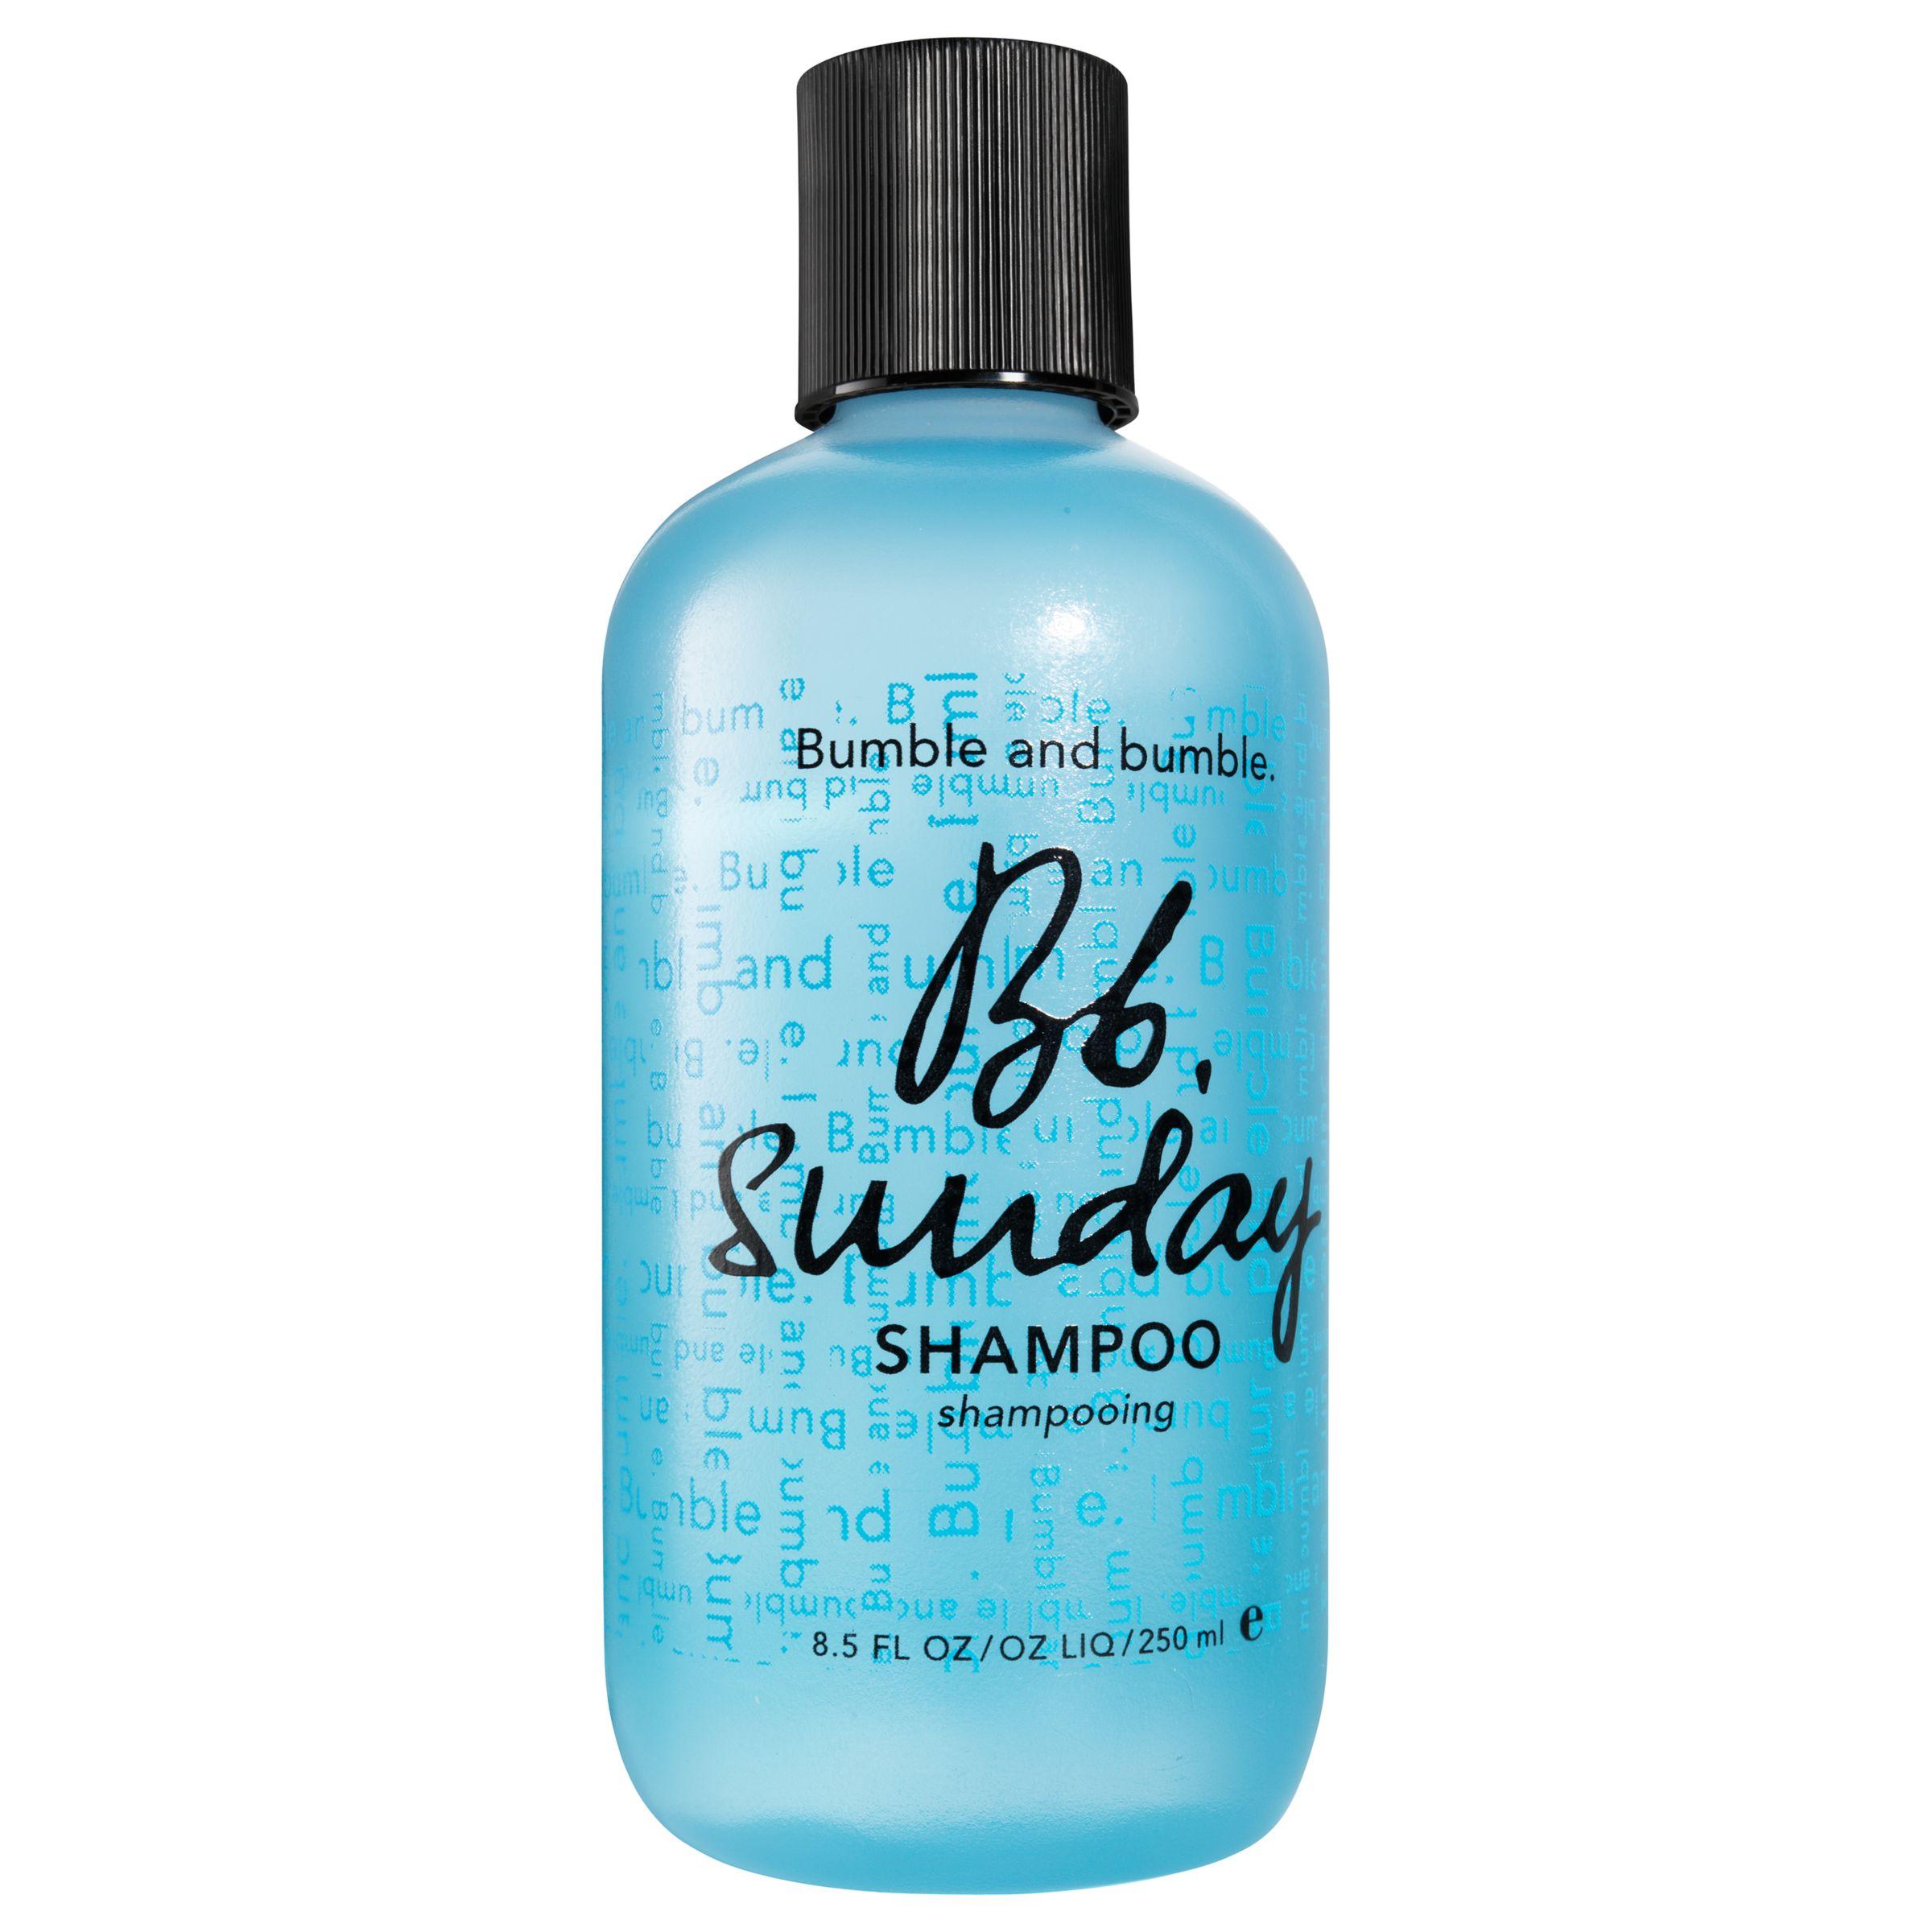 Bumble and bumble Bumble and bumble Sunday Shampoo, 250ml